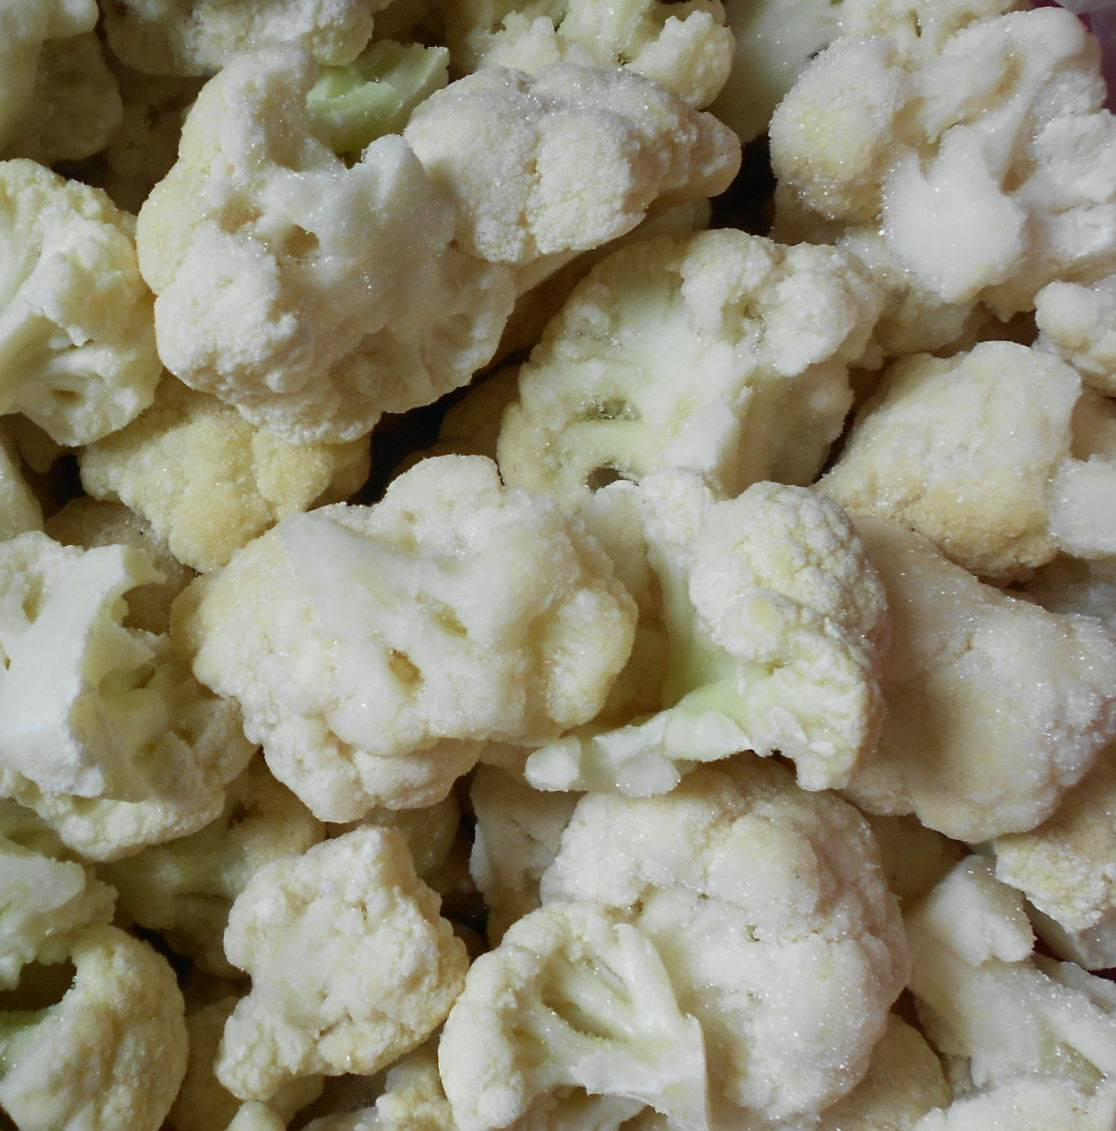 frozen foods frozen vegetables frozen cauliflower 3-5cm cut supply from china